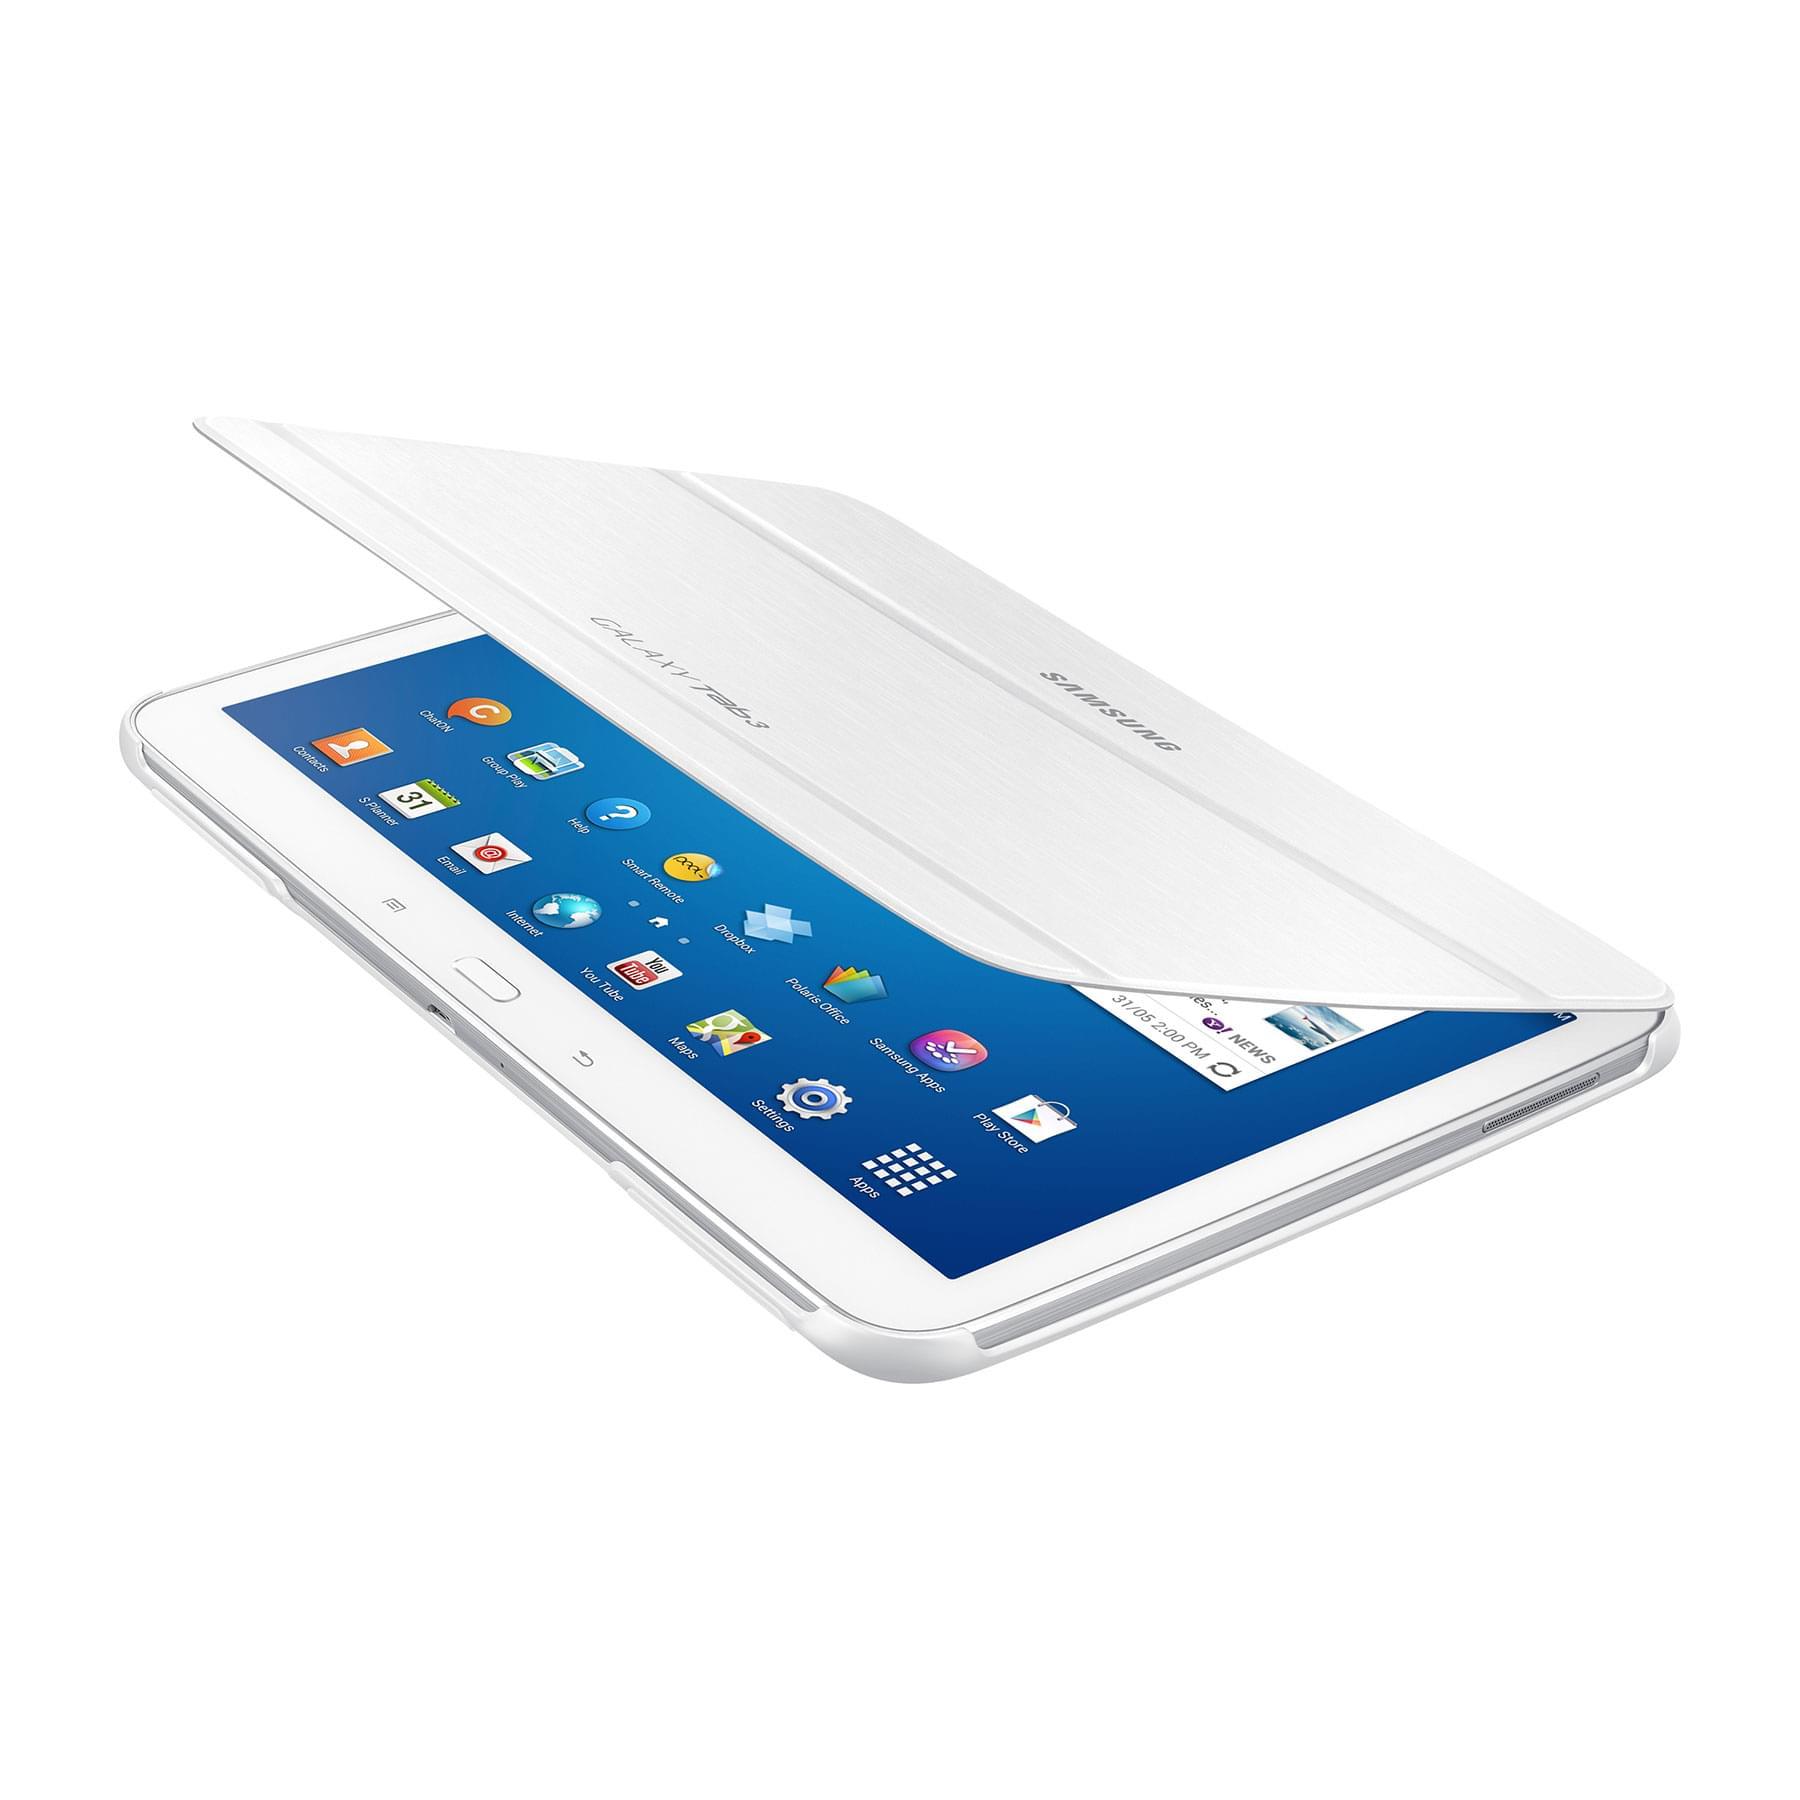 "Samsung Book Cover Galaxy Tab 3 10.1"" White (EF-BP520BWEGWW **) - Achat / Vente Accessoire Tablette sur Cybertek.fr - 0"